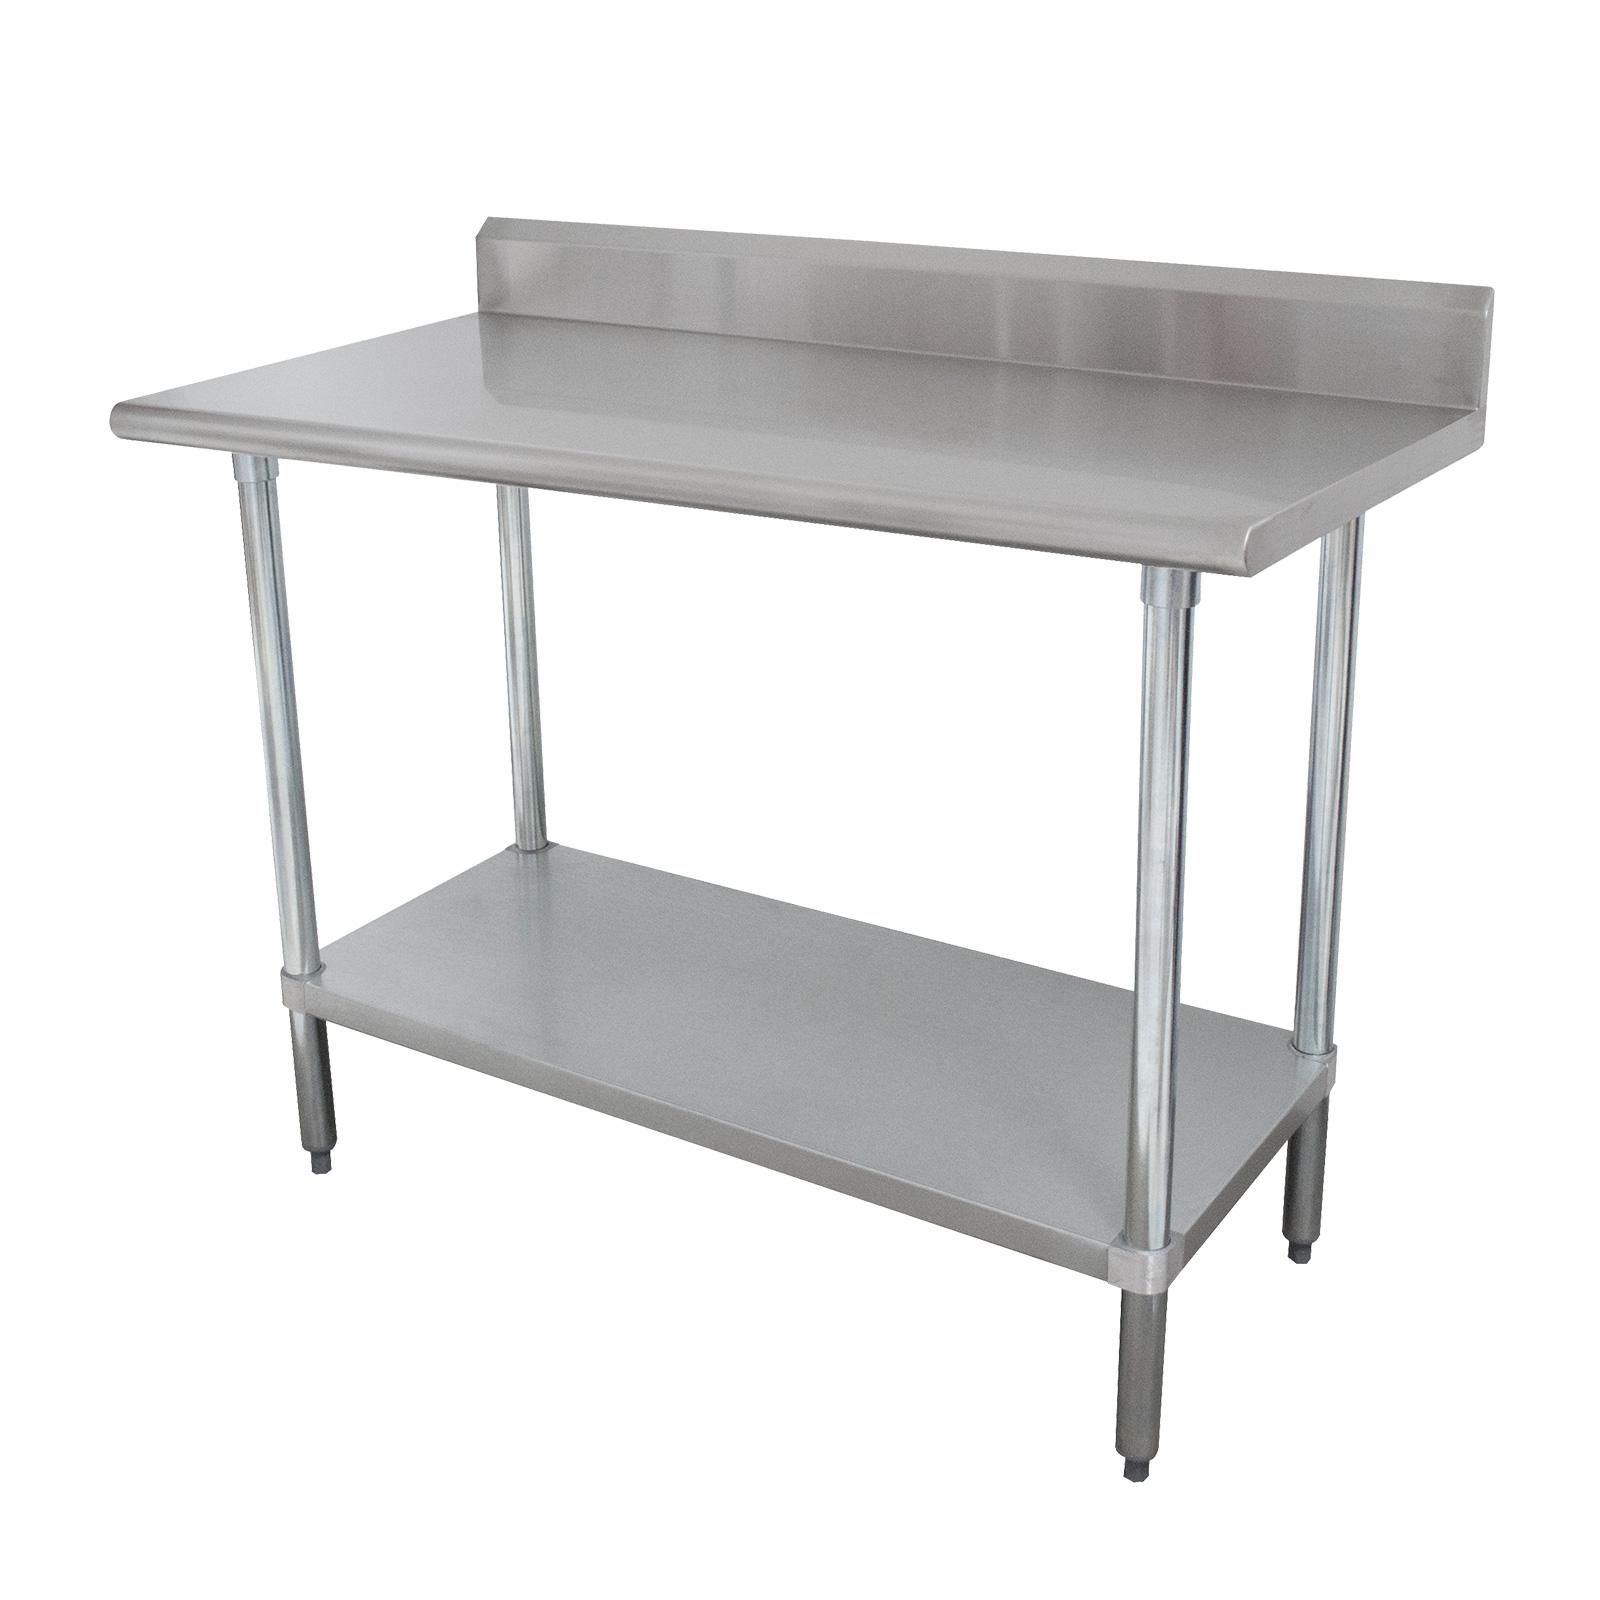 Advance Tabco KSLAG-243-X work table,  36